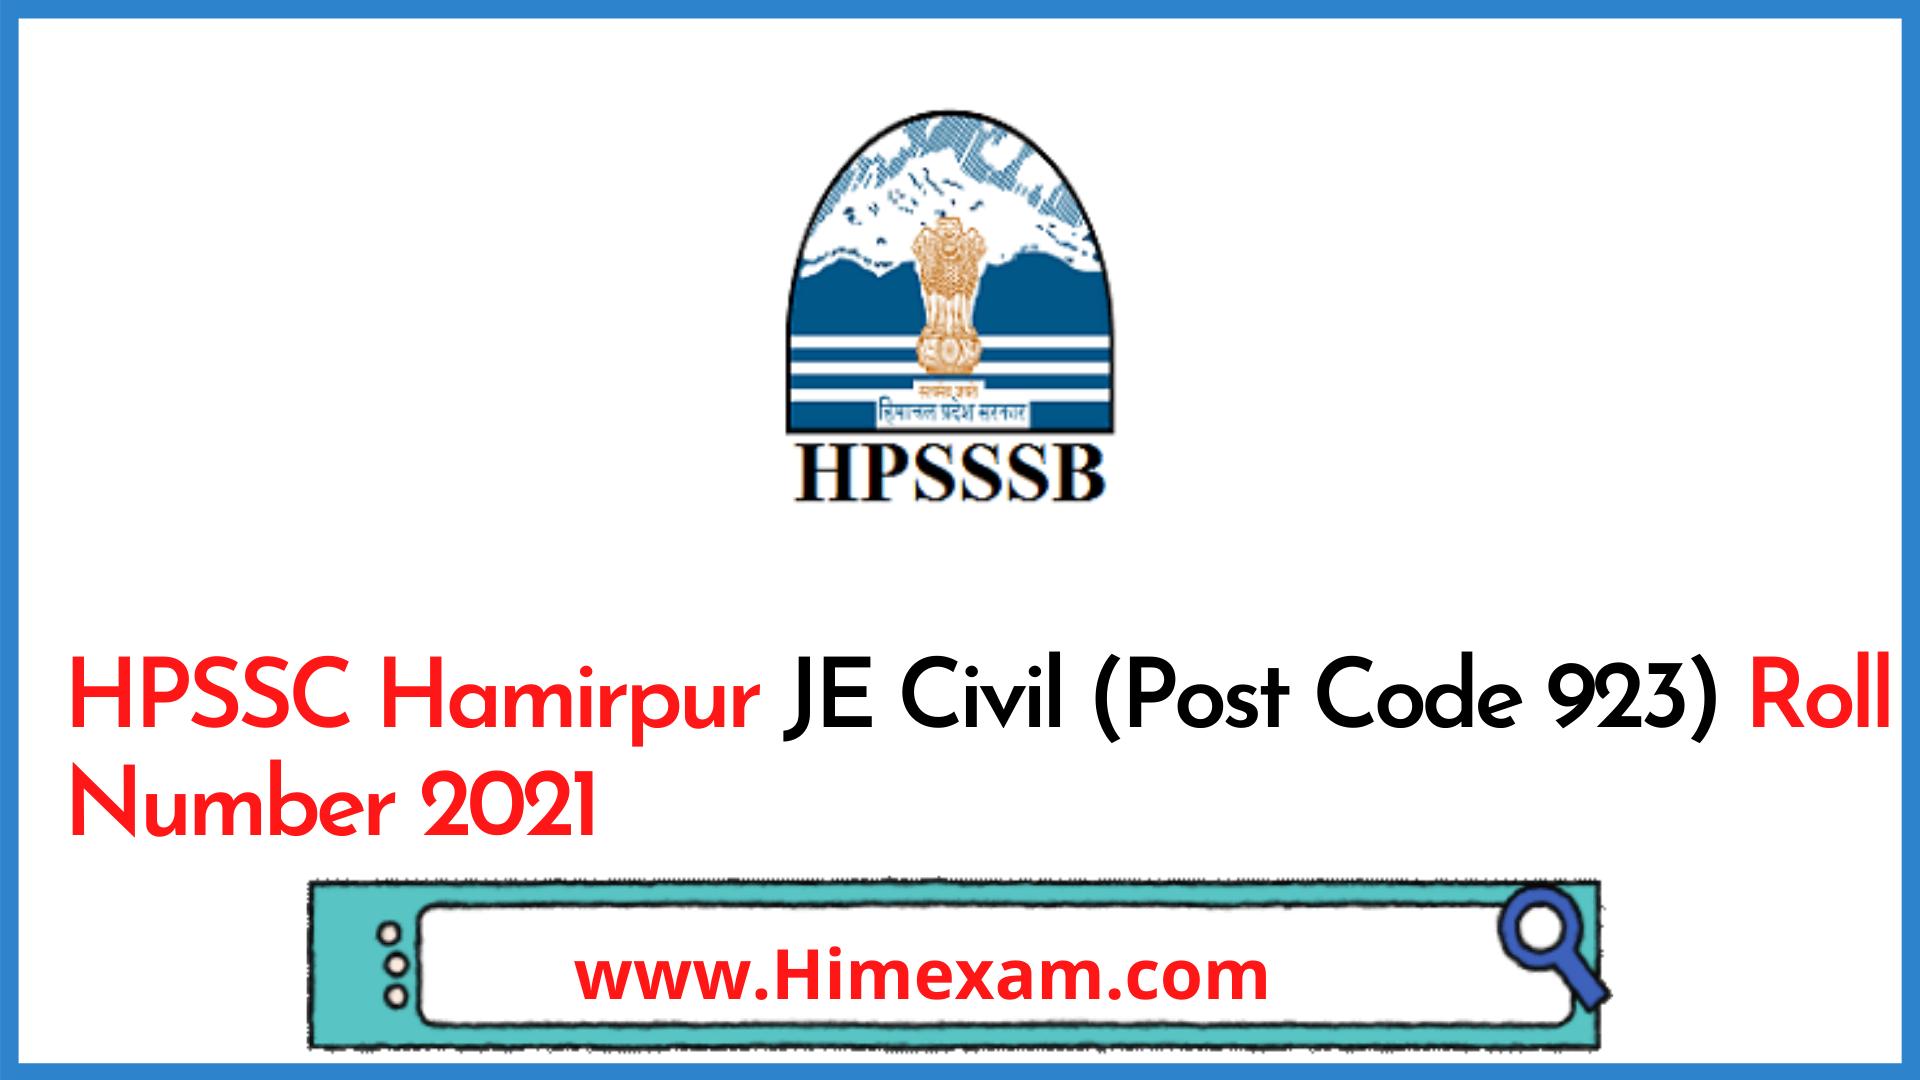 HPSSC Hamirpur JE Civil (Post Code 923) Roll Number 2021